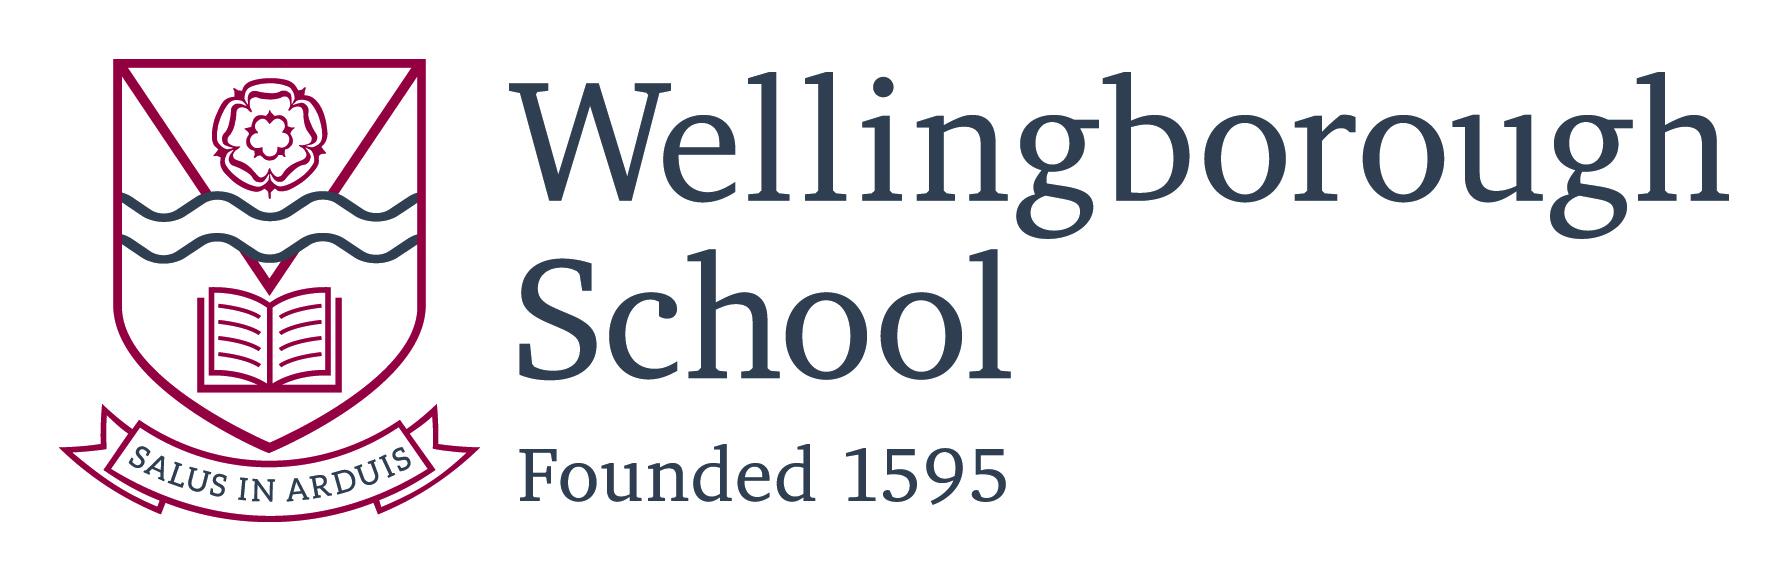 Wellingborough Preparatory School